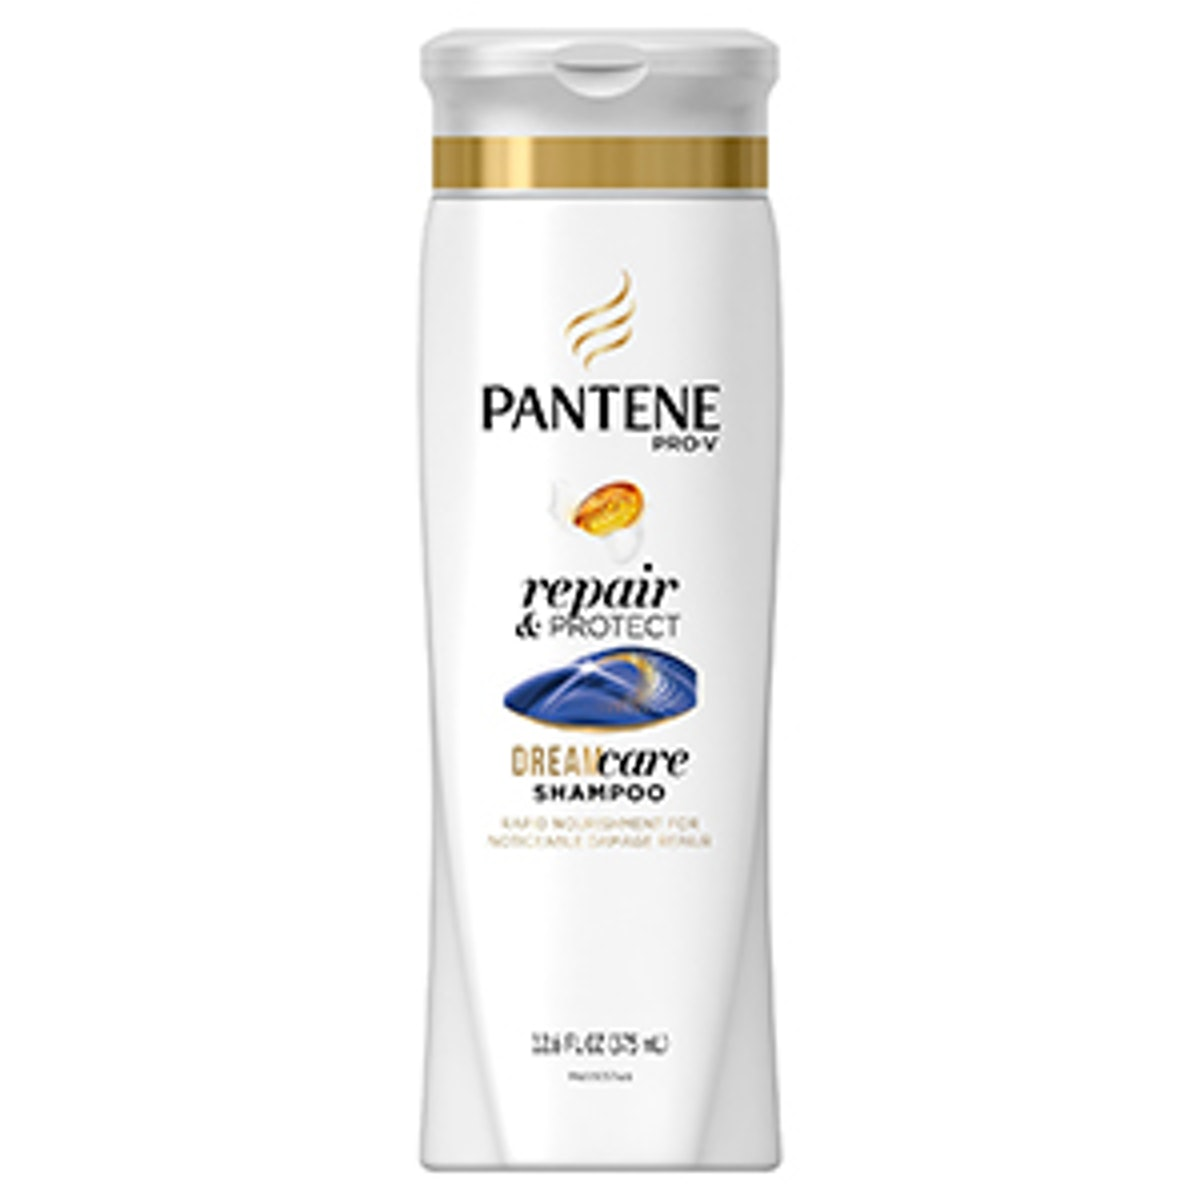 Pantene Repair and Protect Shampoo